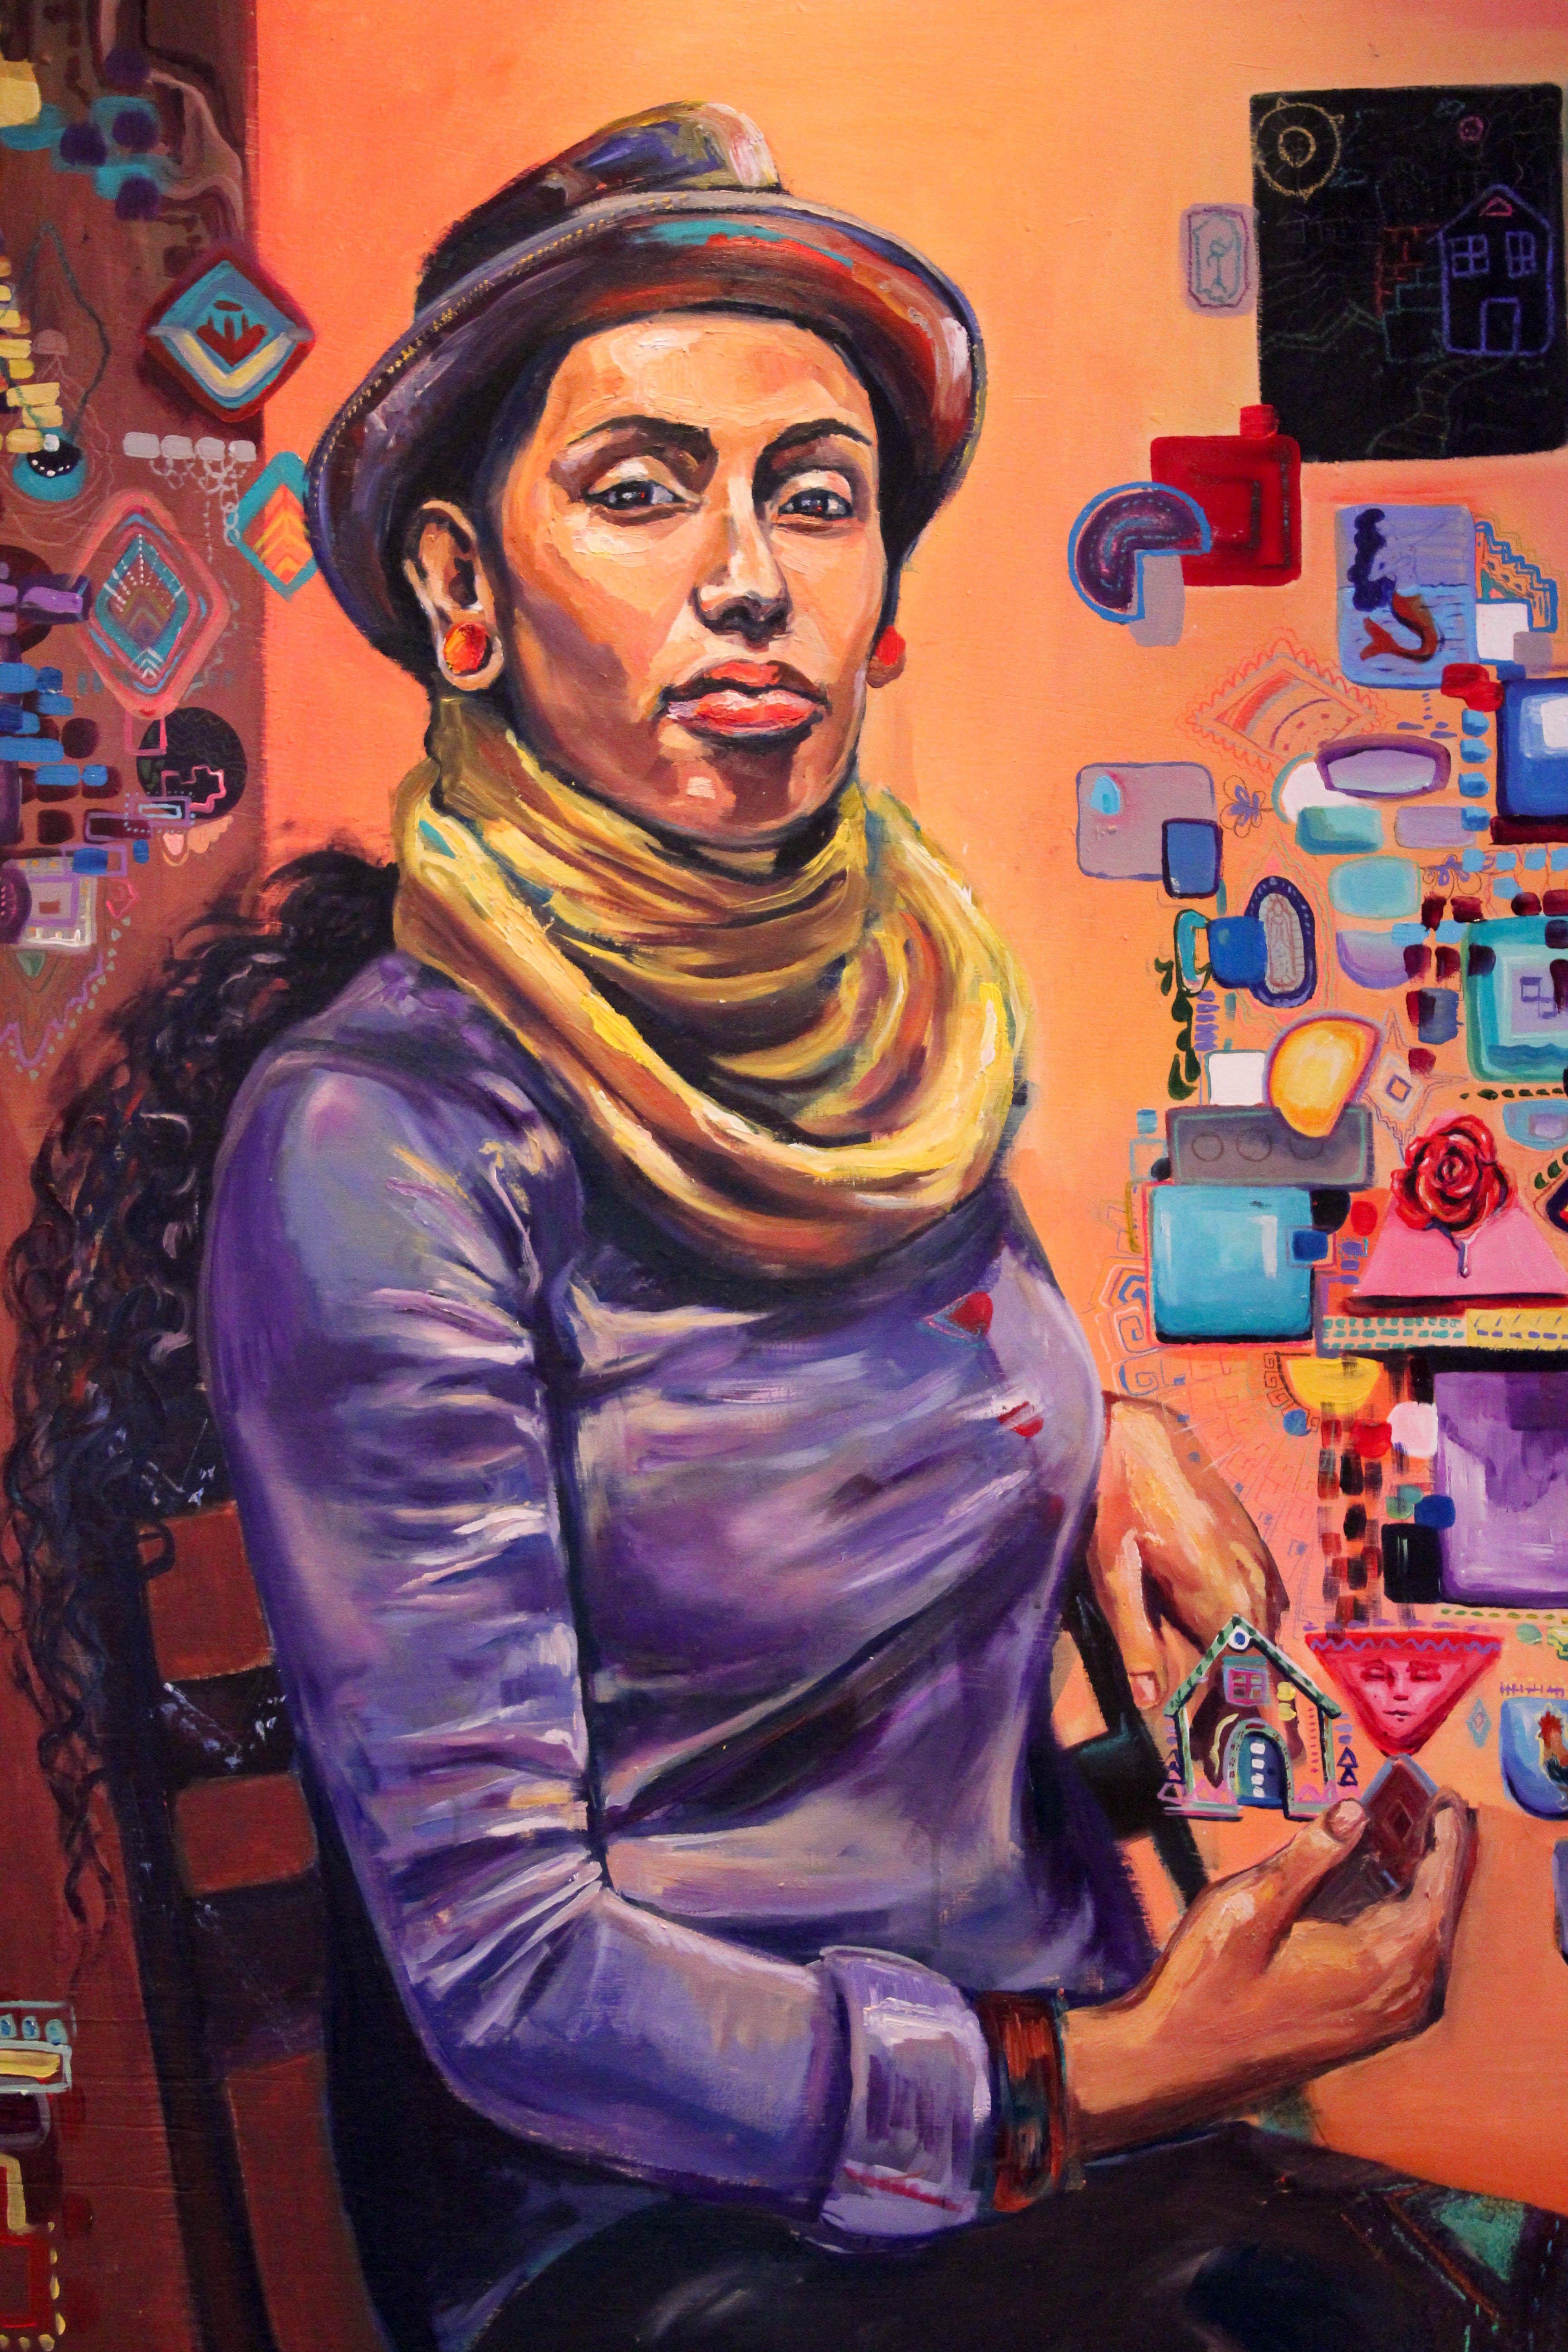 dana schutz fight in an elevator elevator new york and york latino heritage exhibition artist crystal galindo